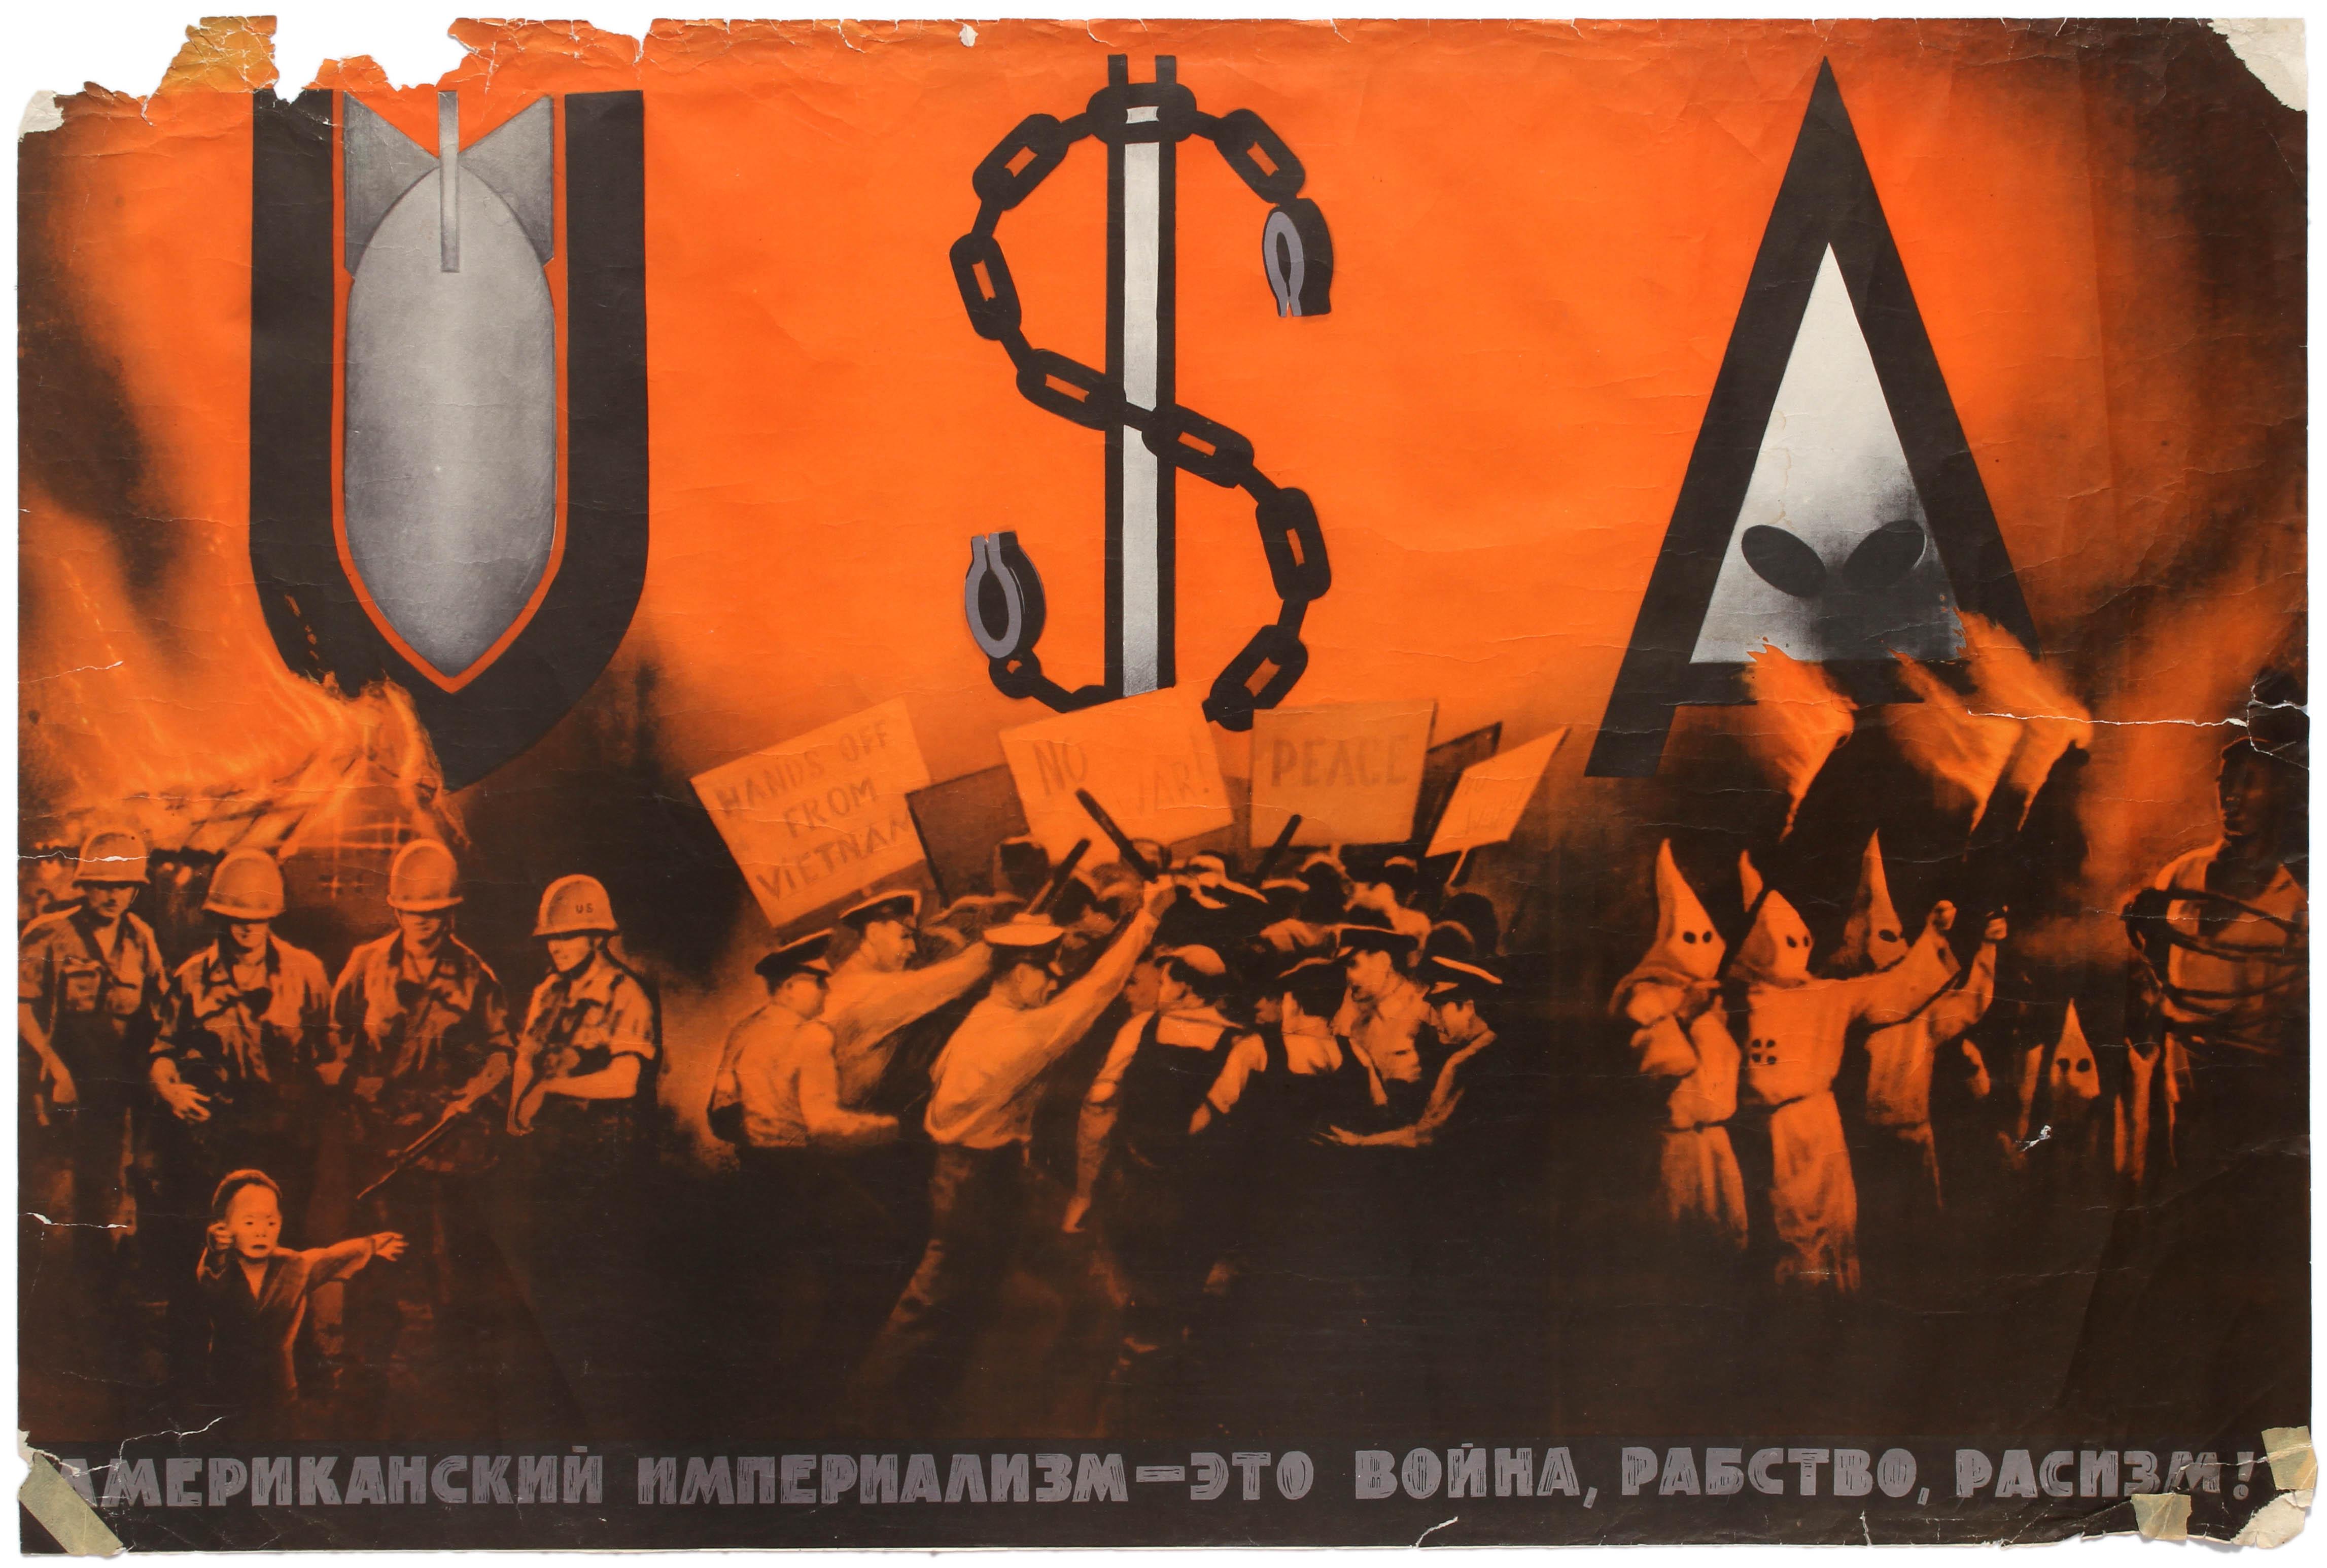 Lot 11 - Propaganda Poster American Imperialism War Slavery Racism Koretsky